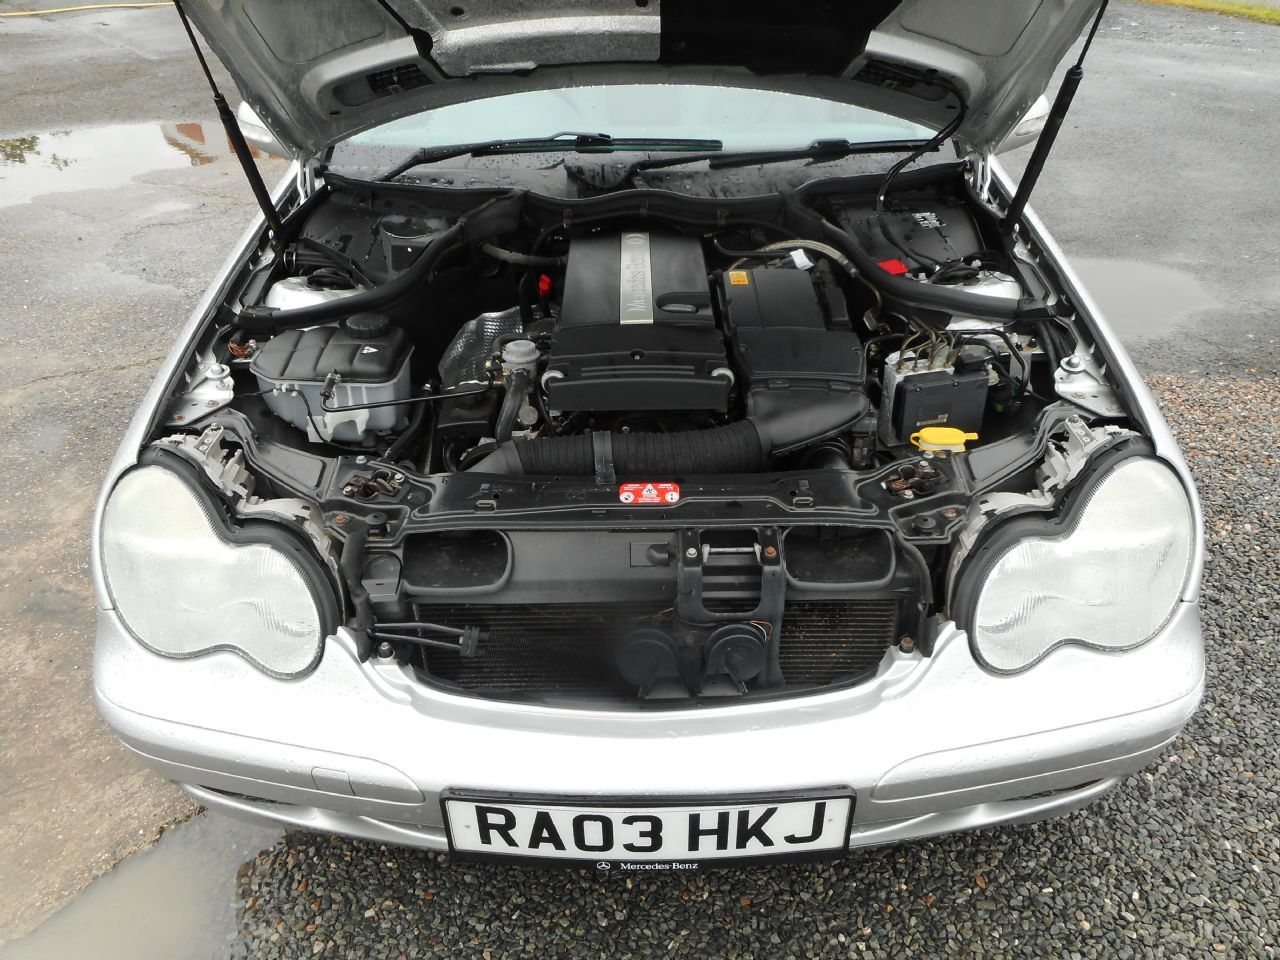 MERCEDES C-CLASS C180 Kompressor Classic SE AUTO (2003) - Picture 15